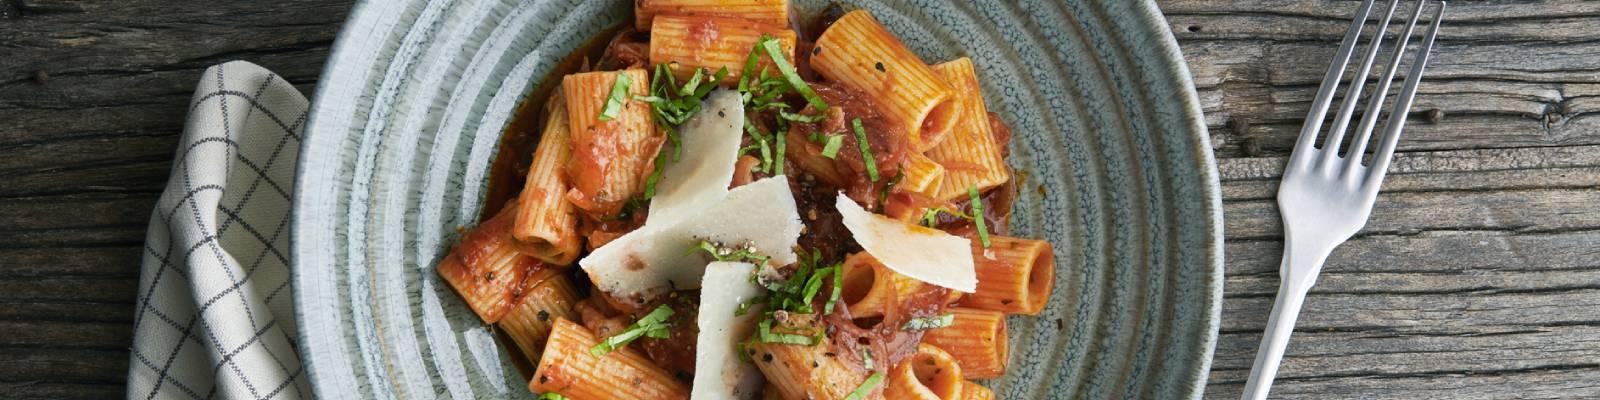 Pasta Garofalo - Rigatoni Garofalo amatriciana